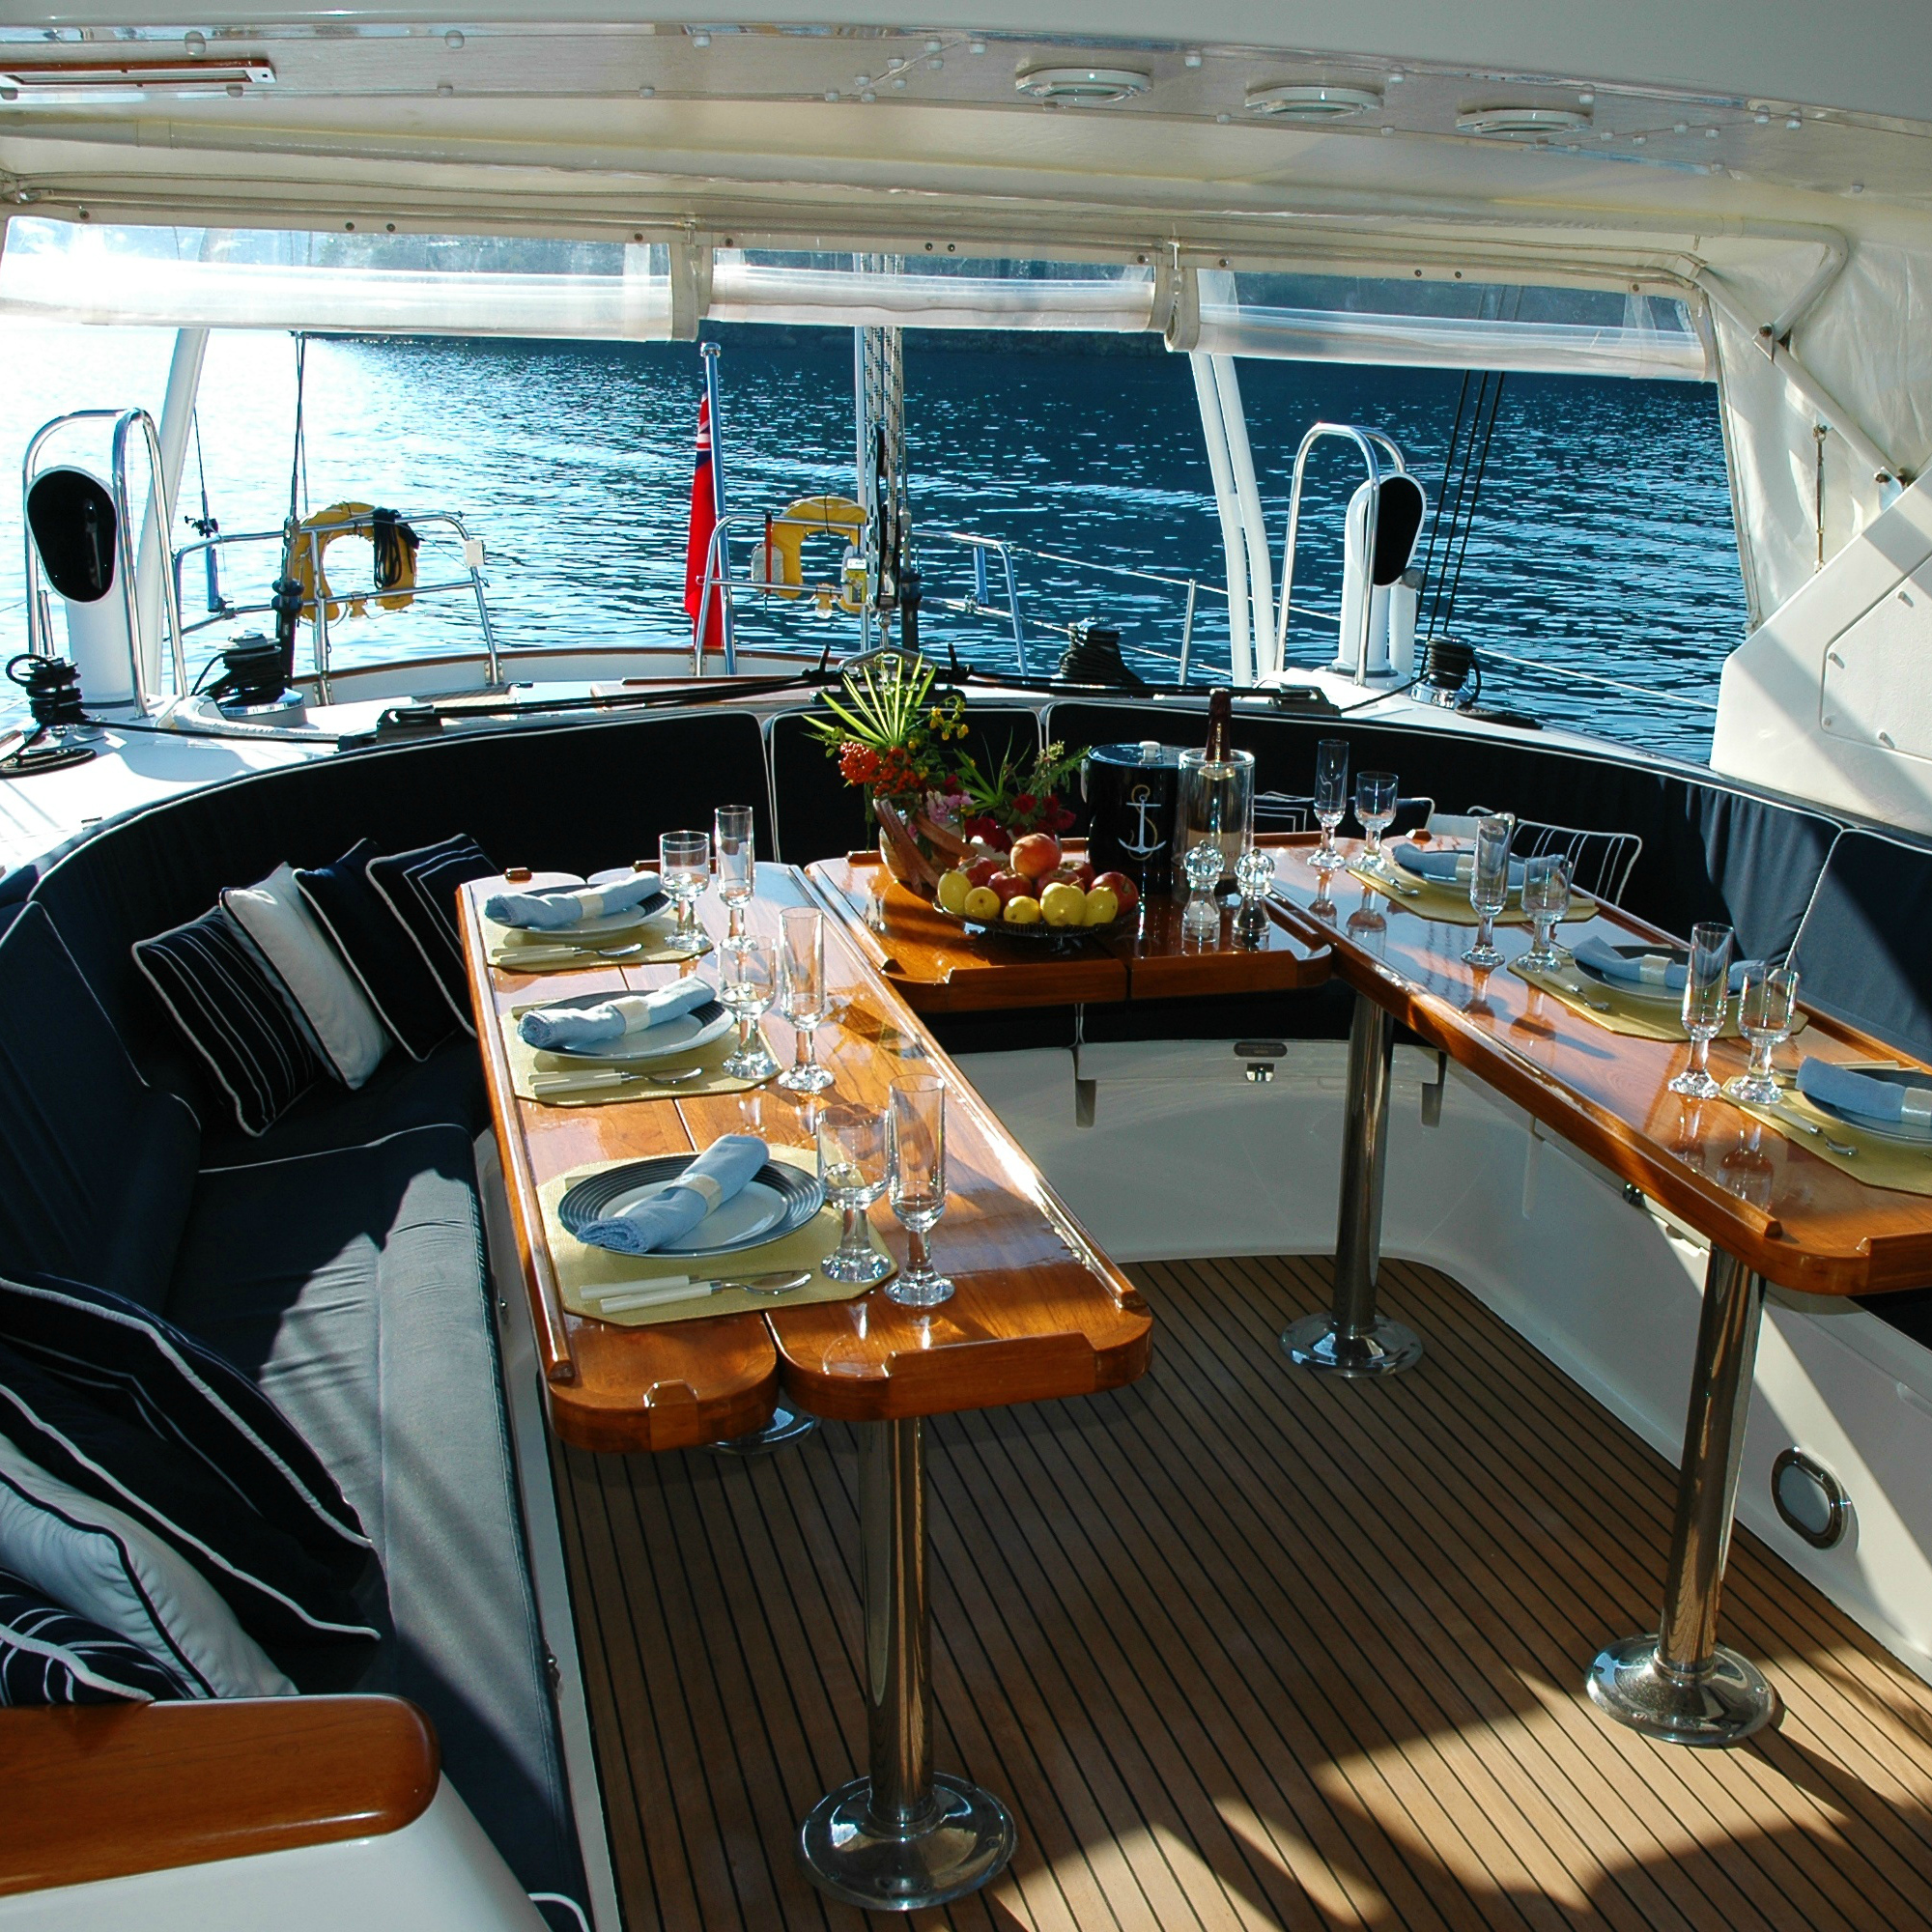 Golds_wine_spirits_yacht_provisioning.jpg